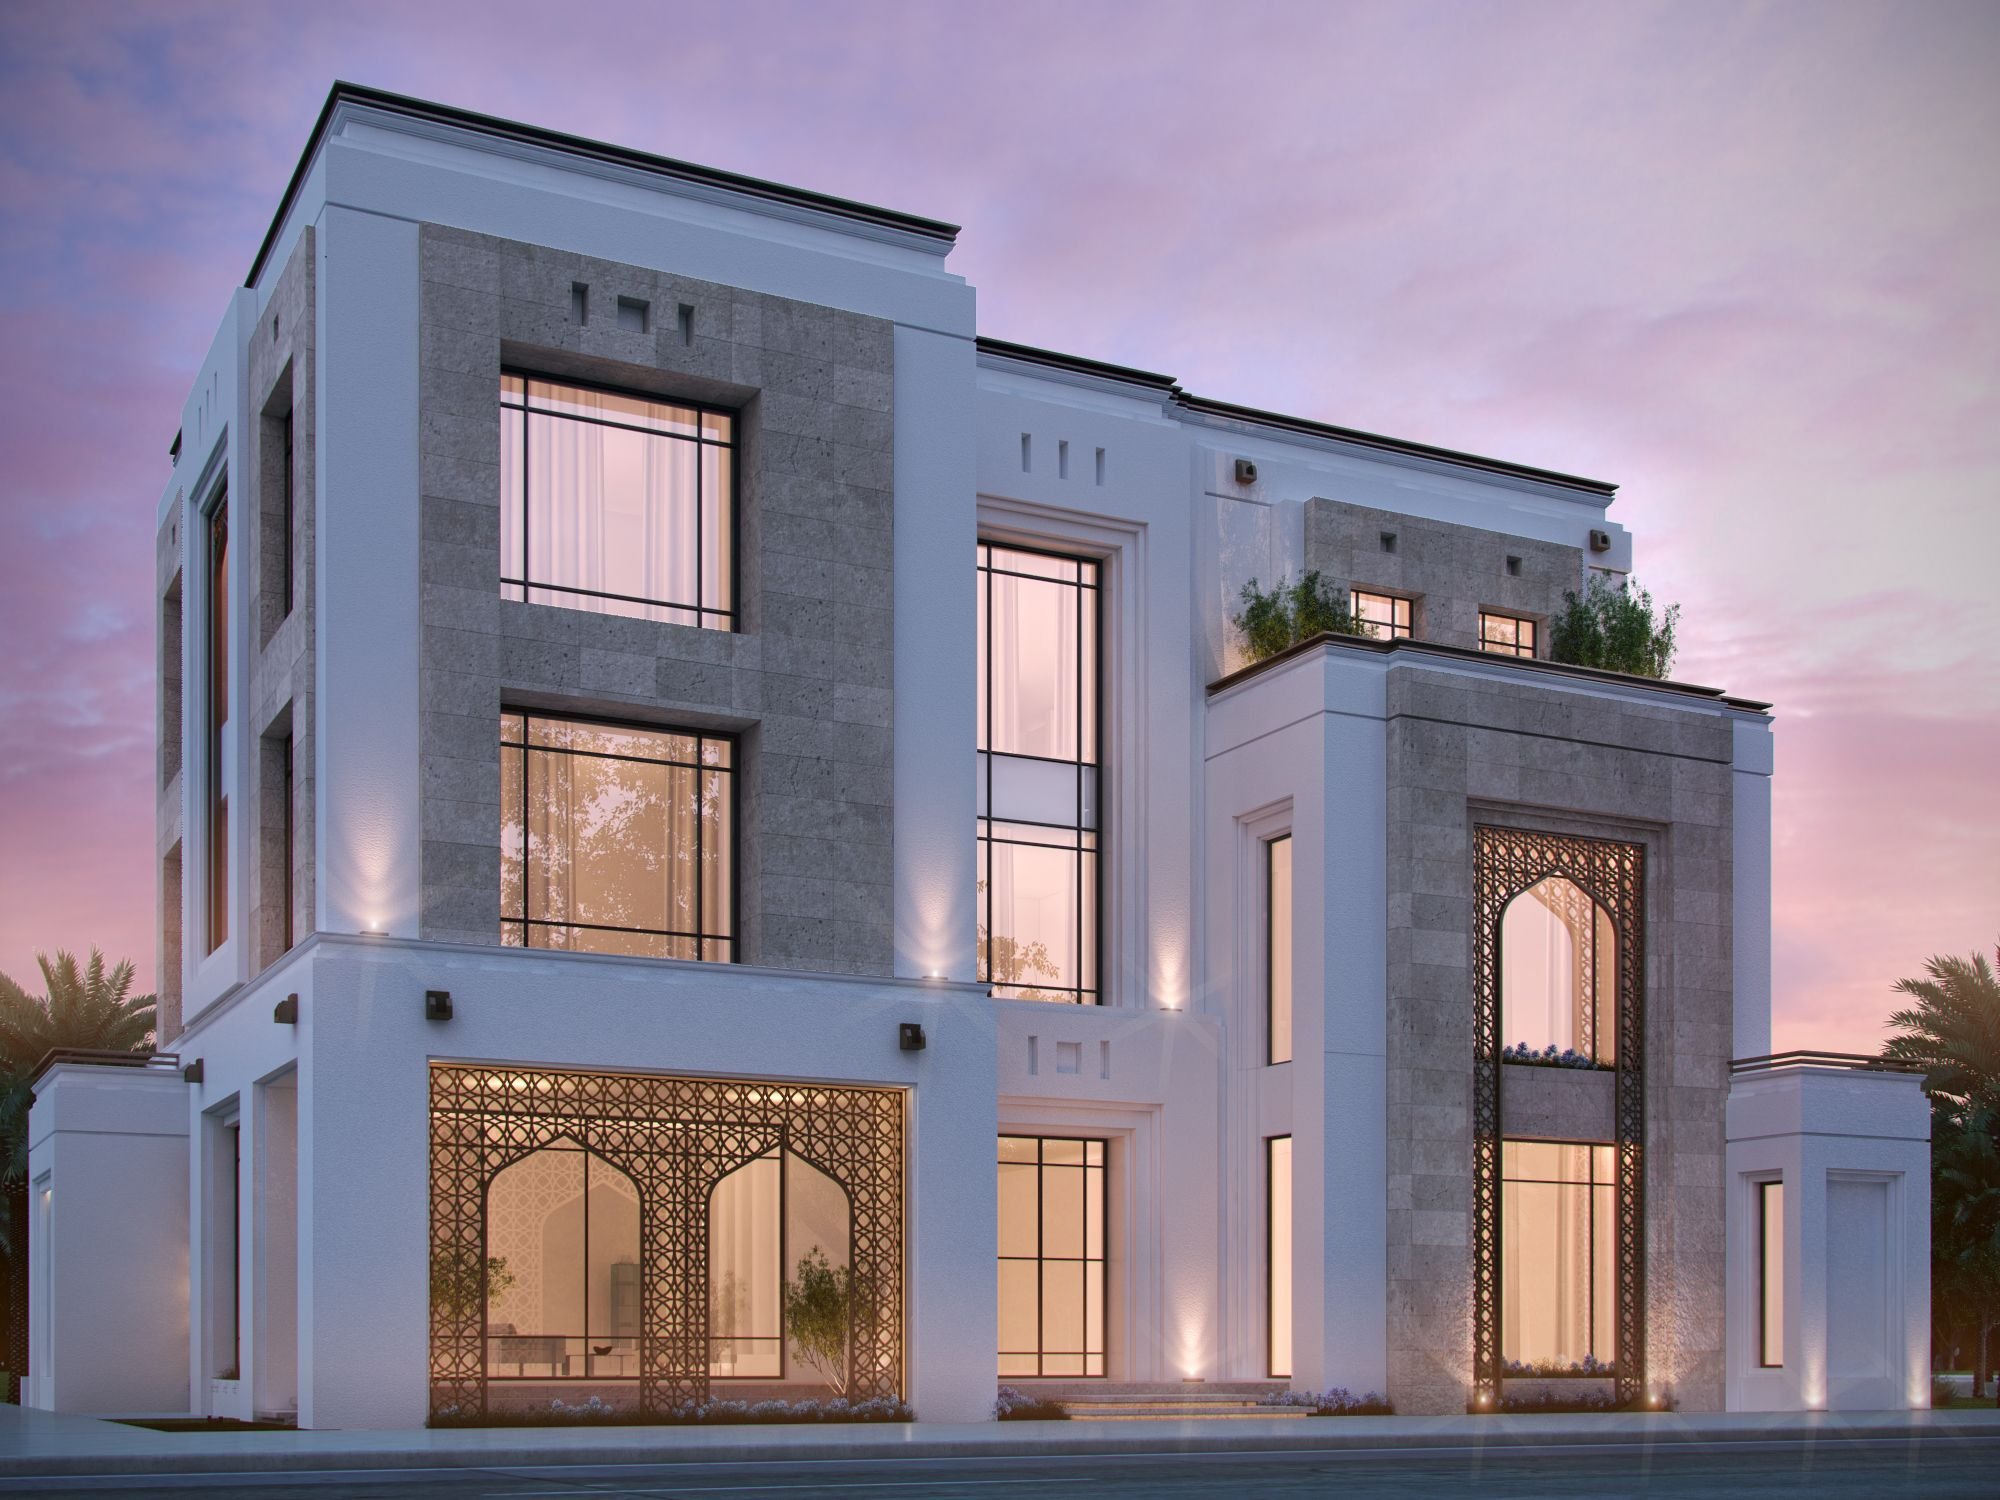 Private Villa 400 M Kuwait Sarah Sadeq Architects Mansion Designs Architecture Facade House